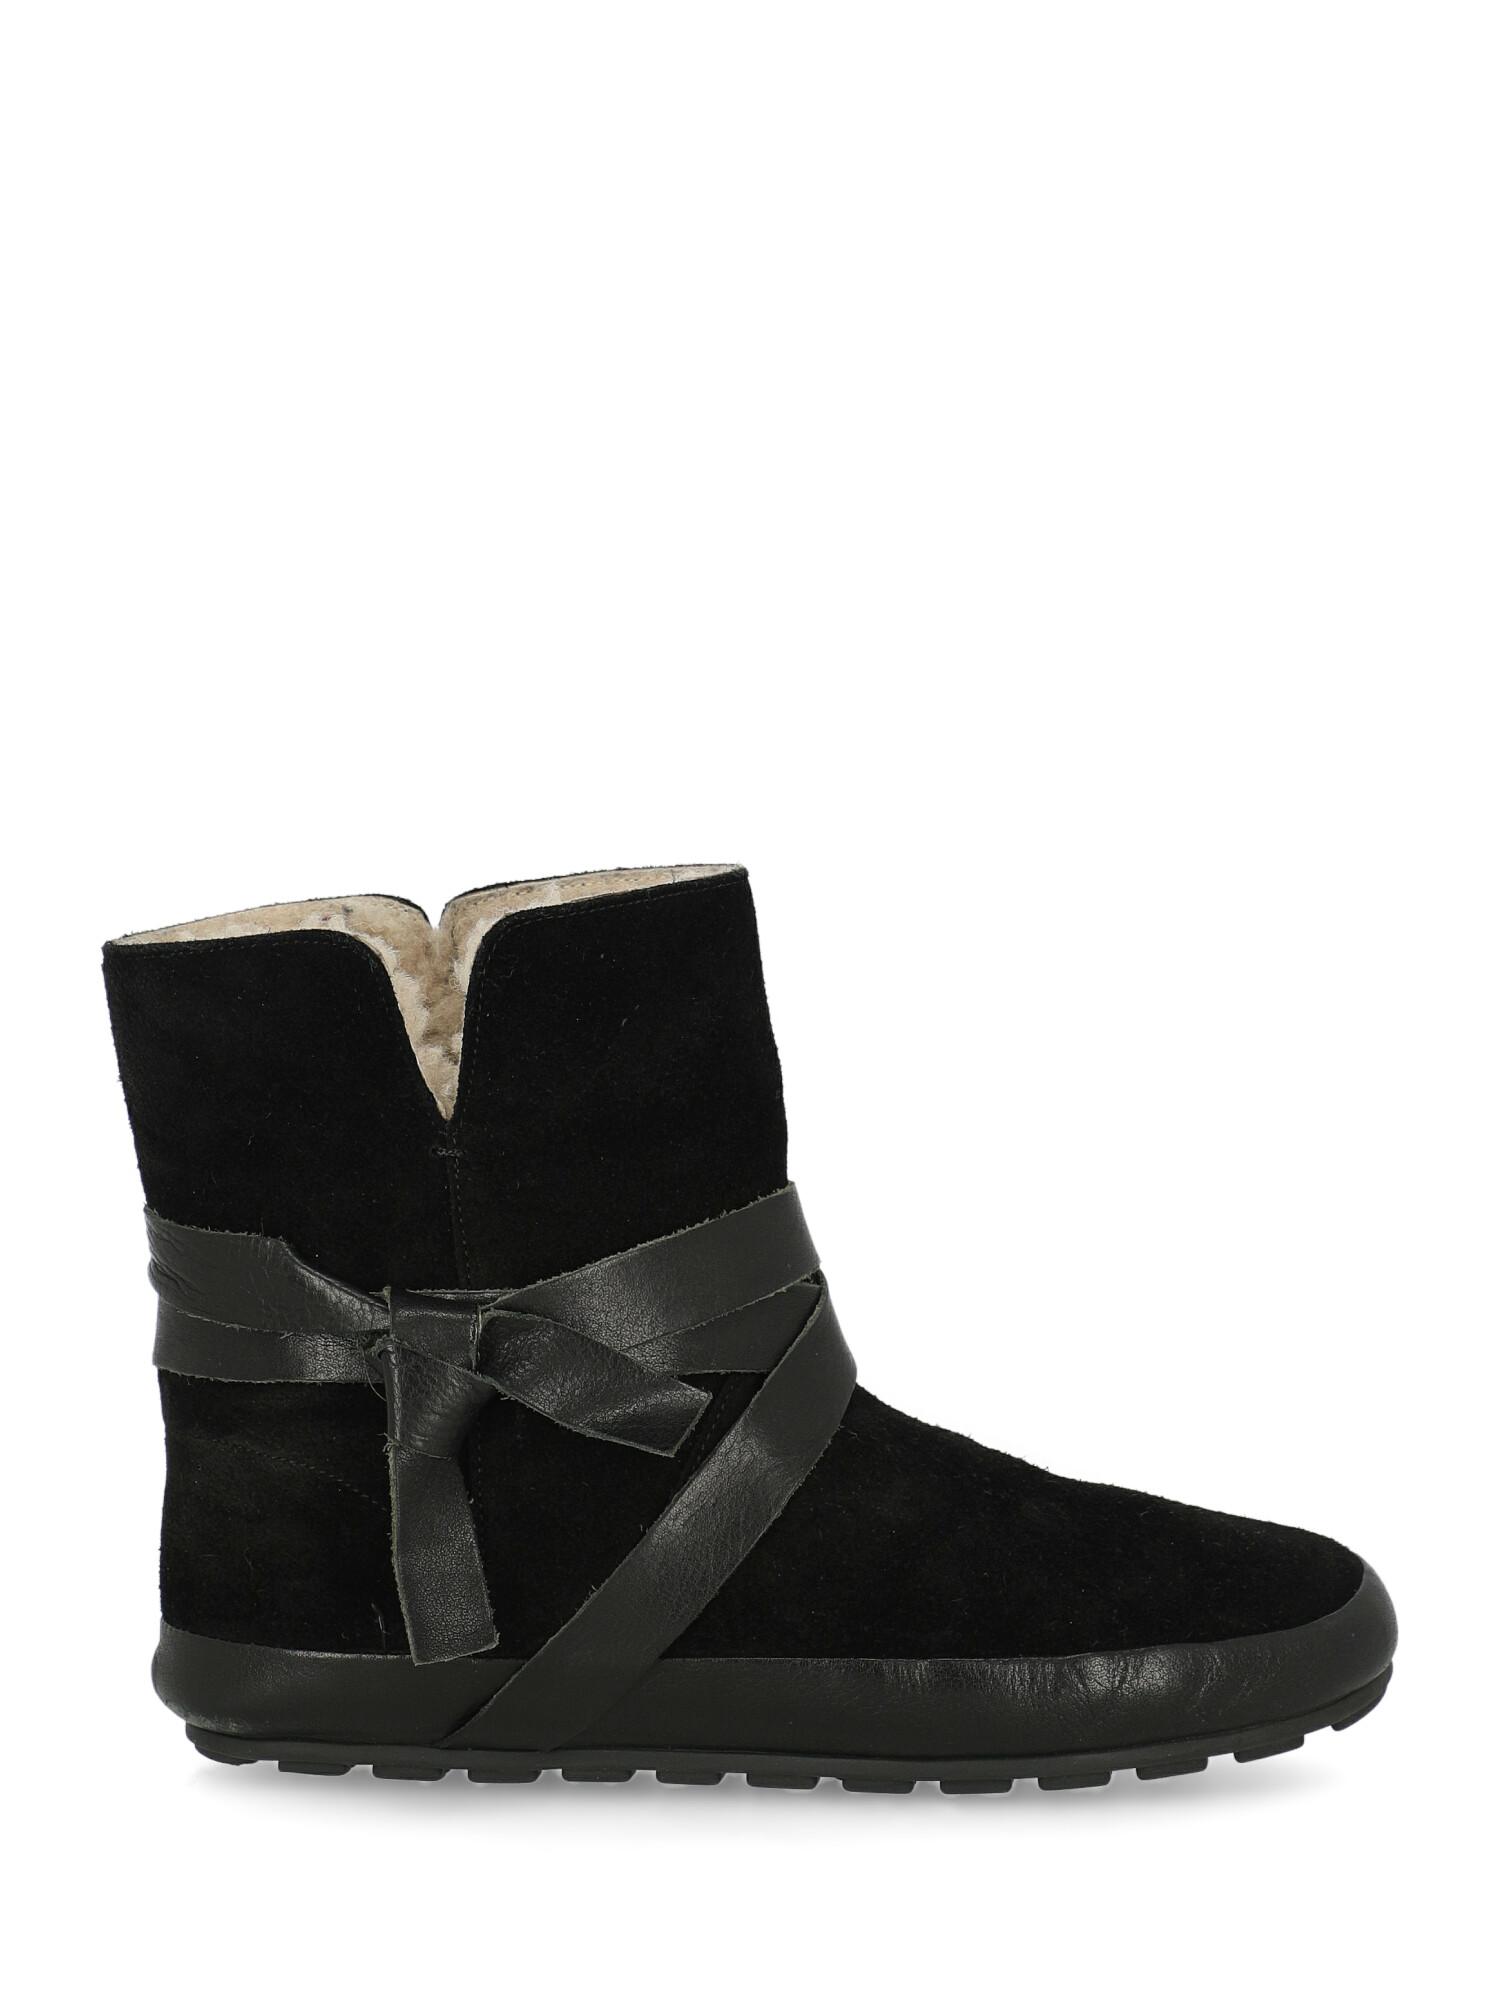 Pre-owned Isabel Marant Étoile Shoe In Black